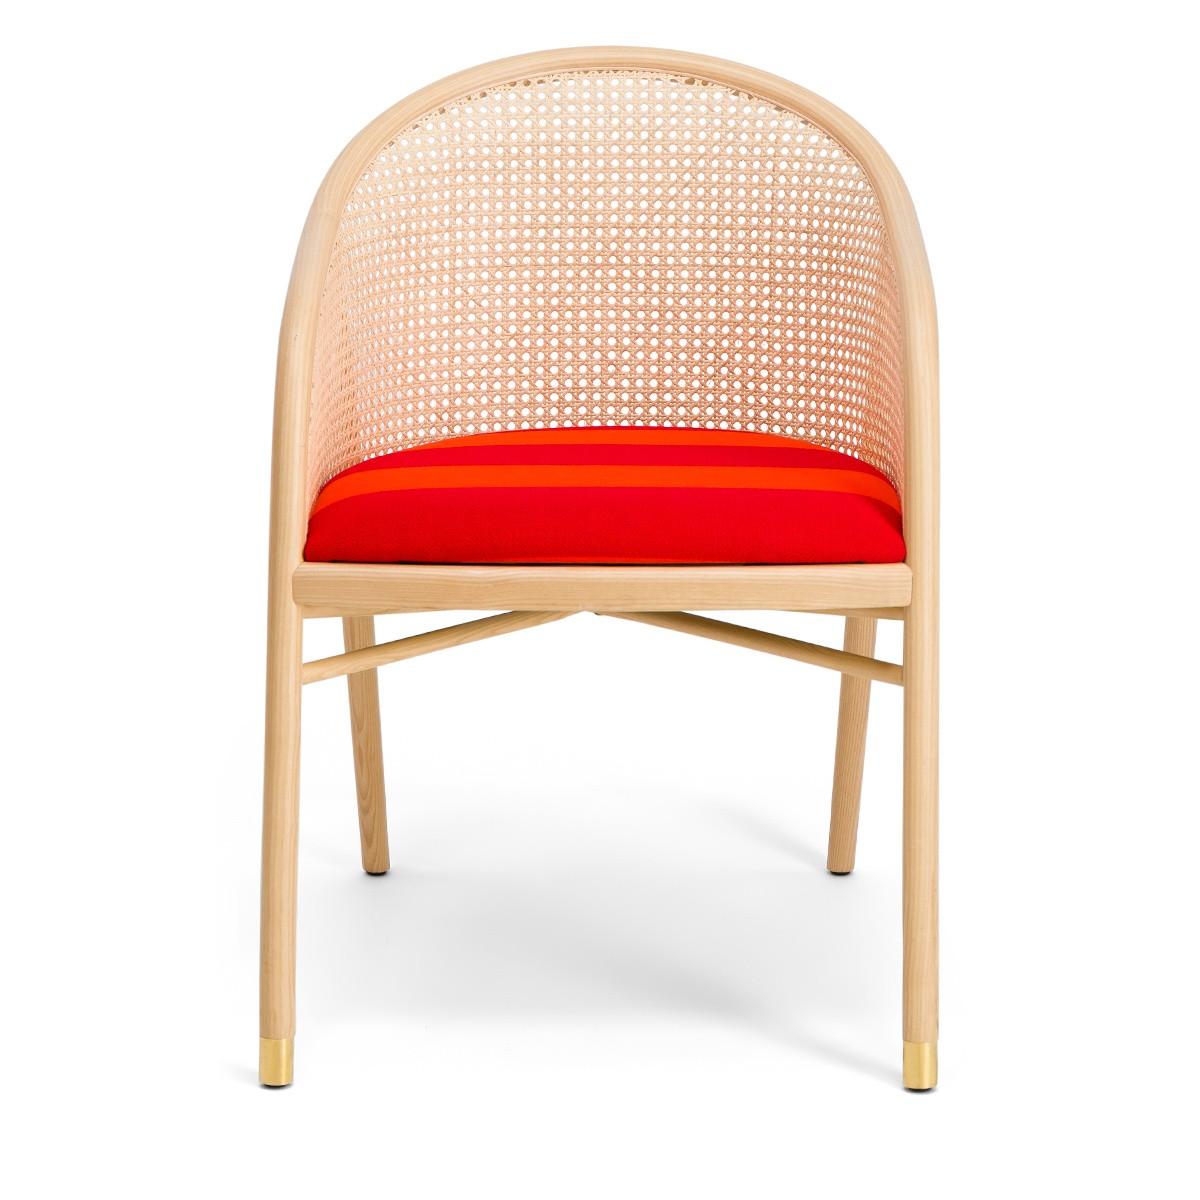 Cavallo Armchair, Kvadrat / Raf Simons Orange Wool with Natural Frame - Limited Edition